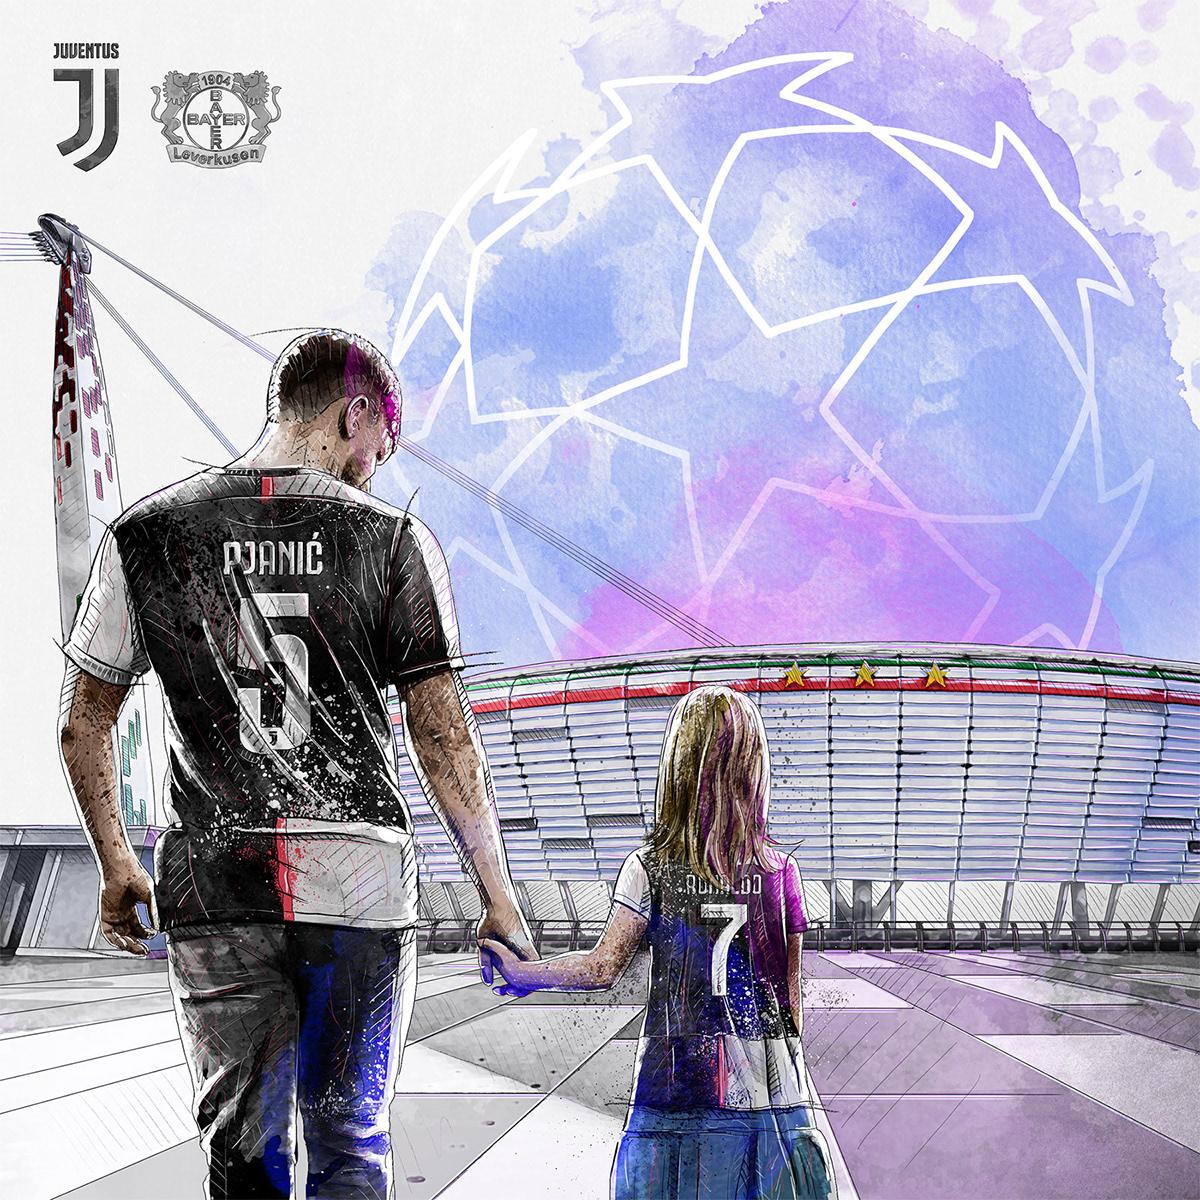 Dynamic sport/football illustration for Juventus vs Bayer 04 Leverksen: Stadium, father and daughter